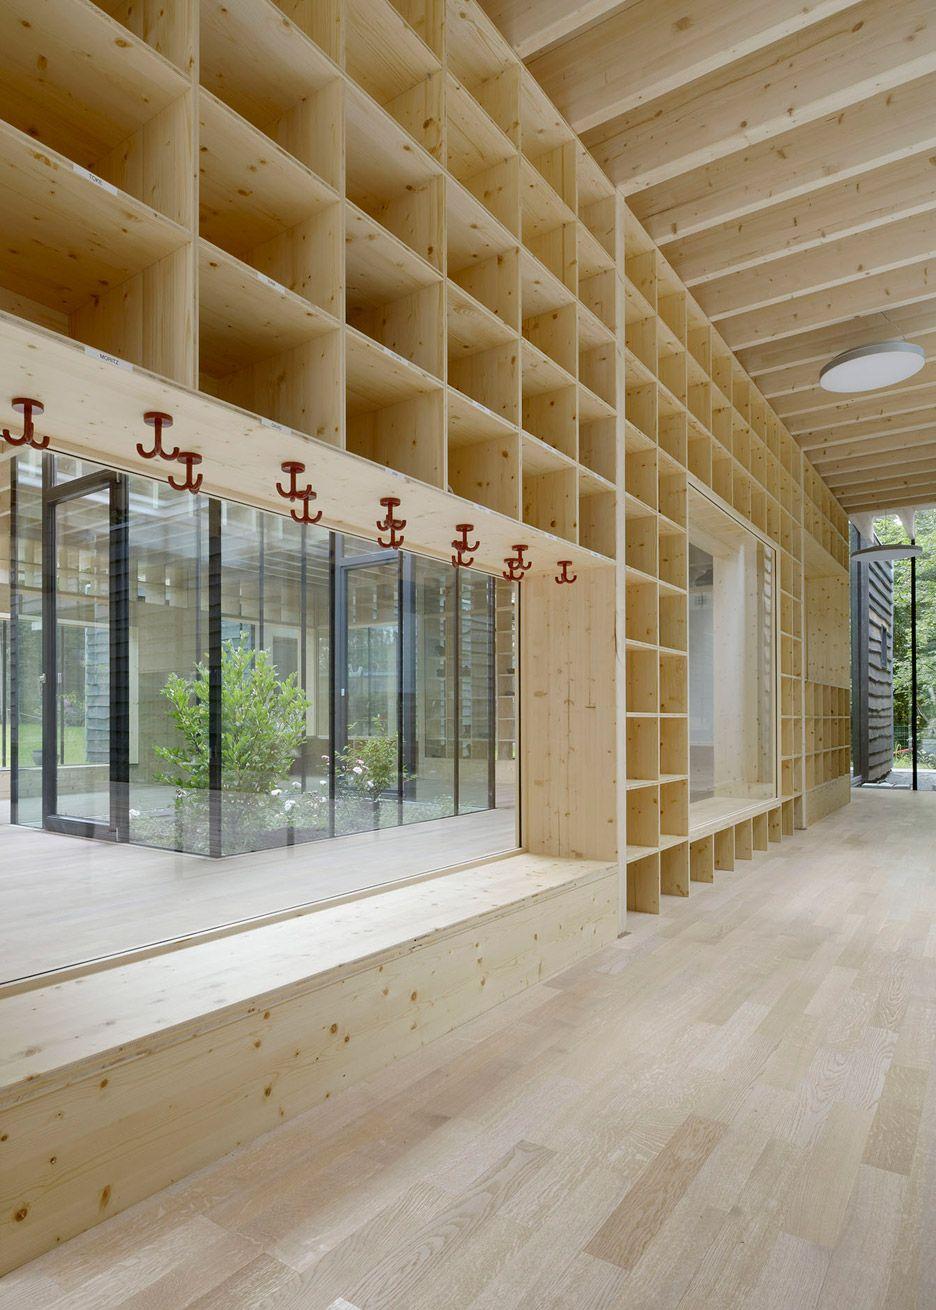 kinderkrippe by kraus schonberg architekten a timber nursery school in hamburg germany. Black Bedroom Furniture Sets. Home Design Ideas